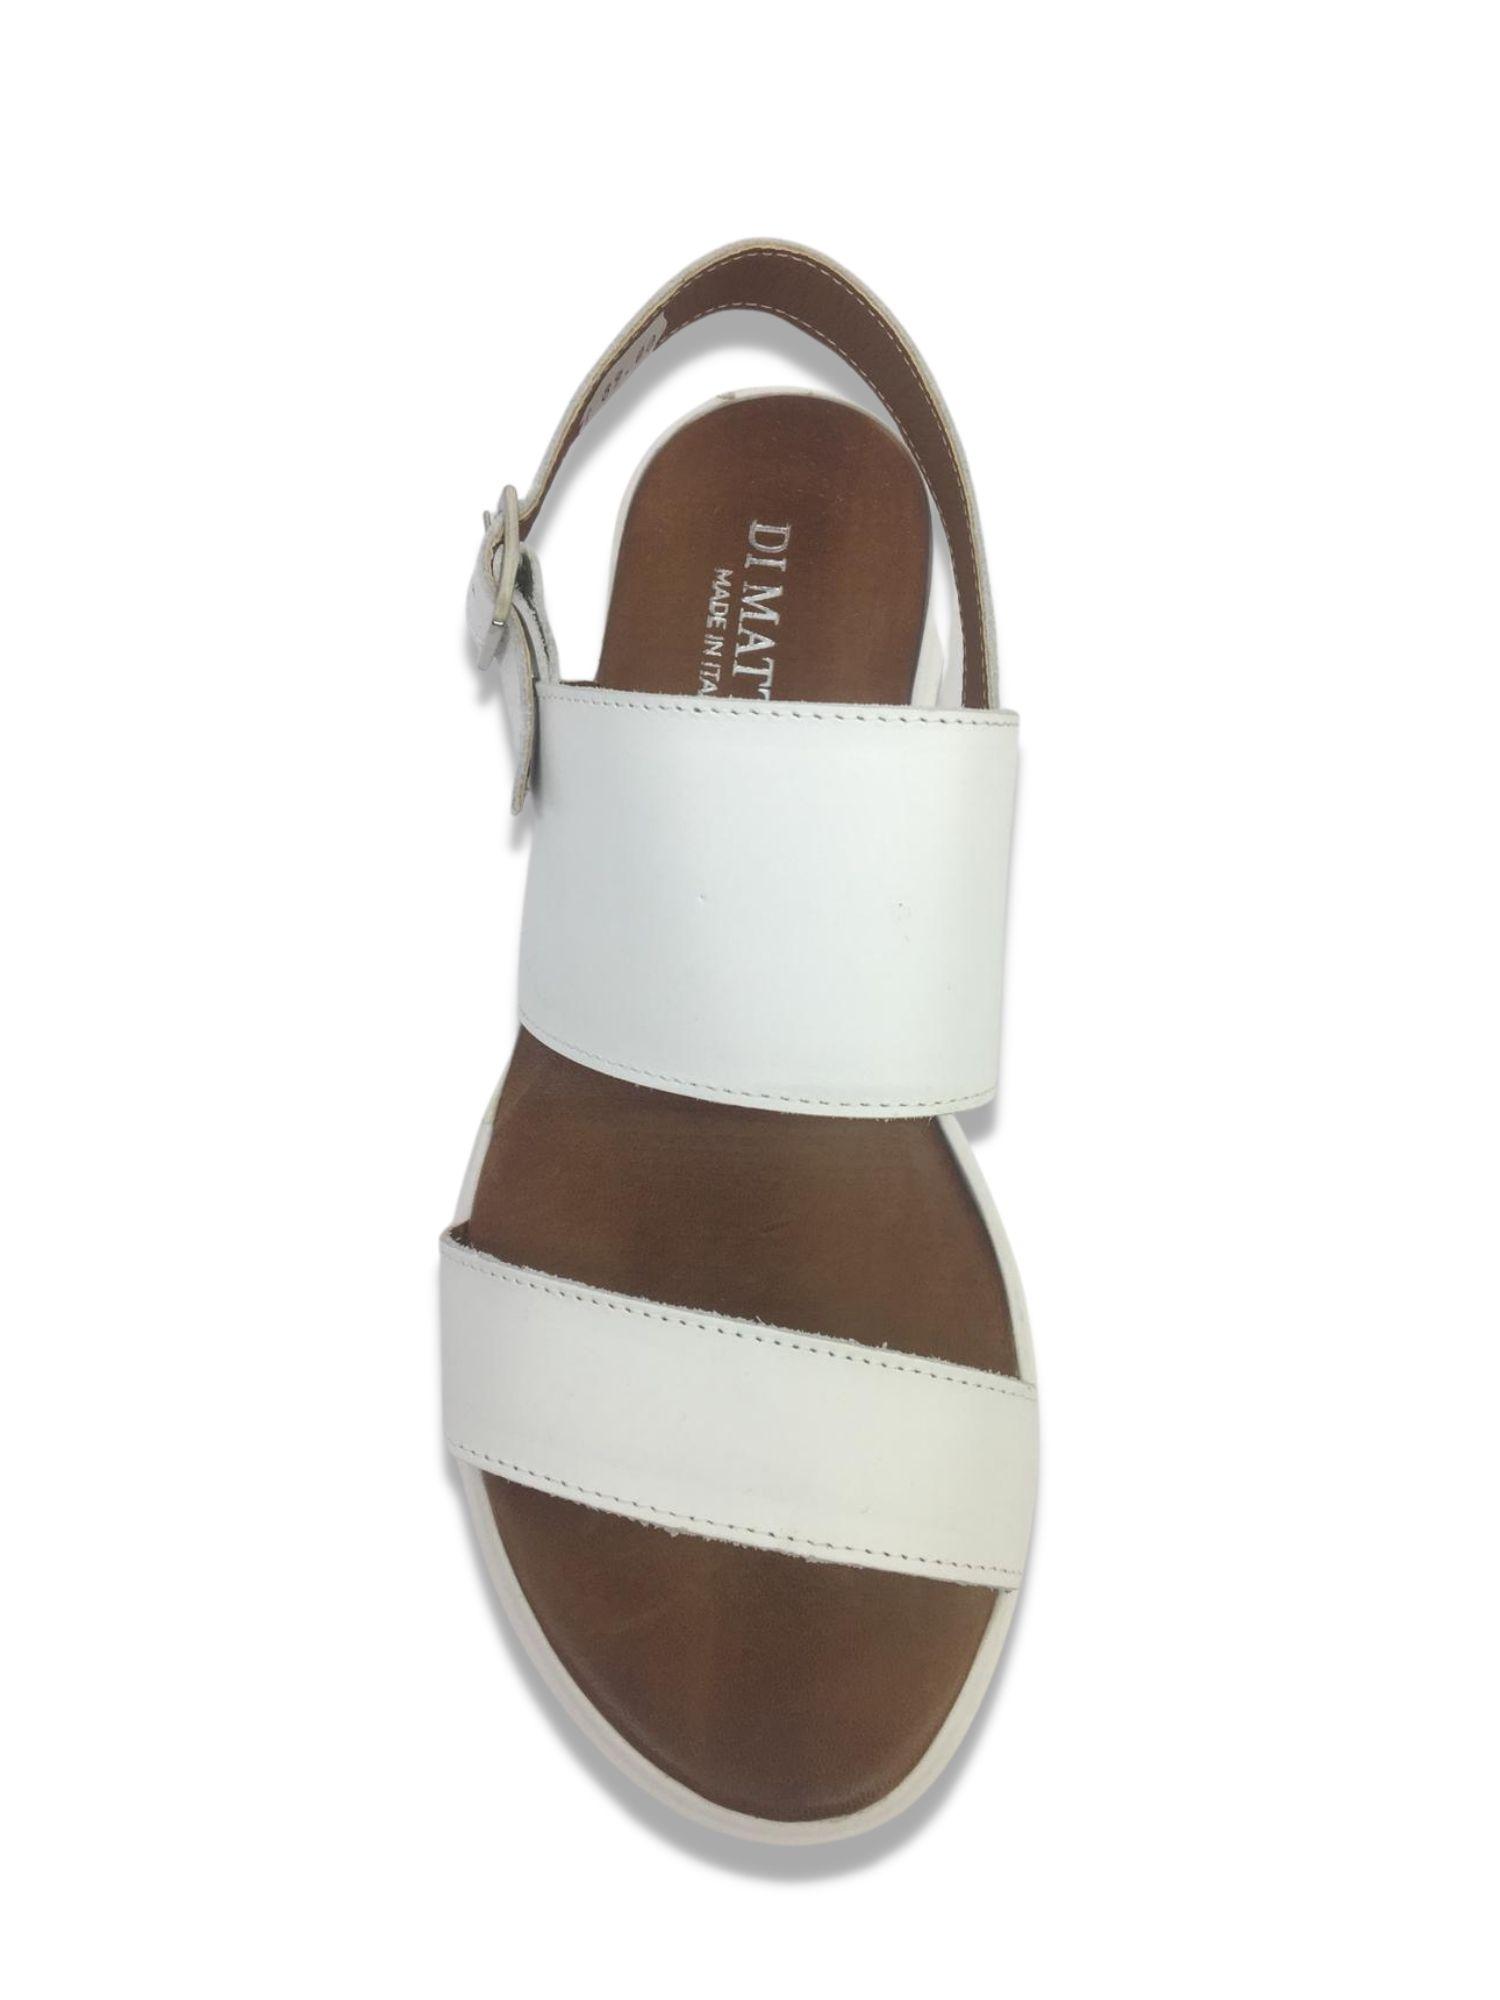 Sandalo Made in Italy 413 Bianco alto